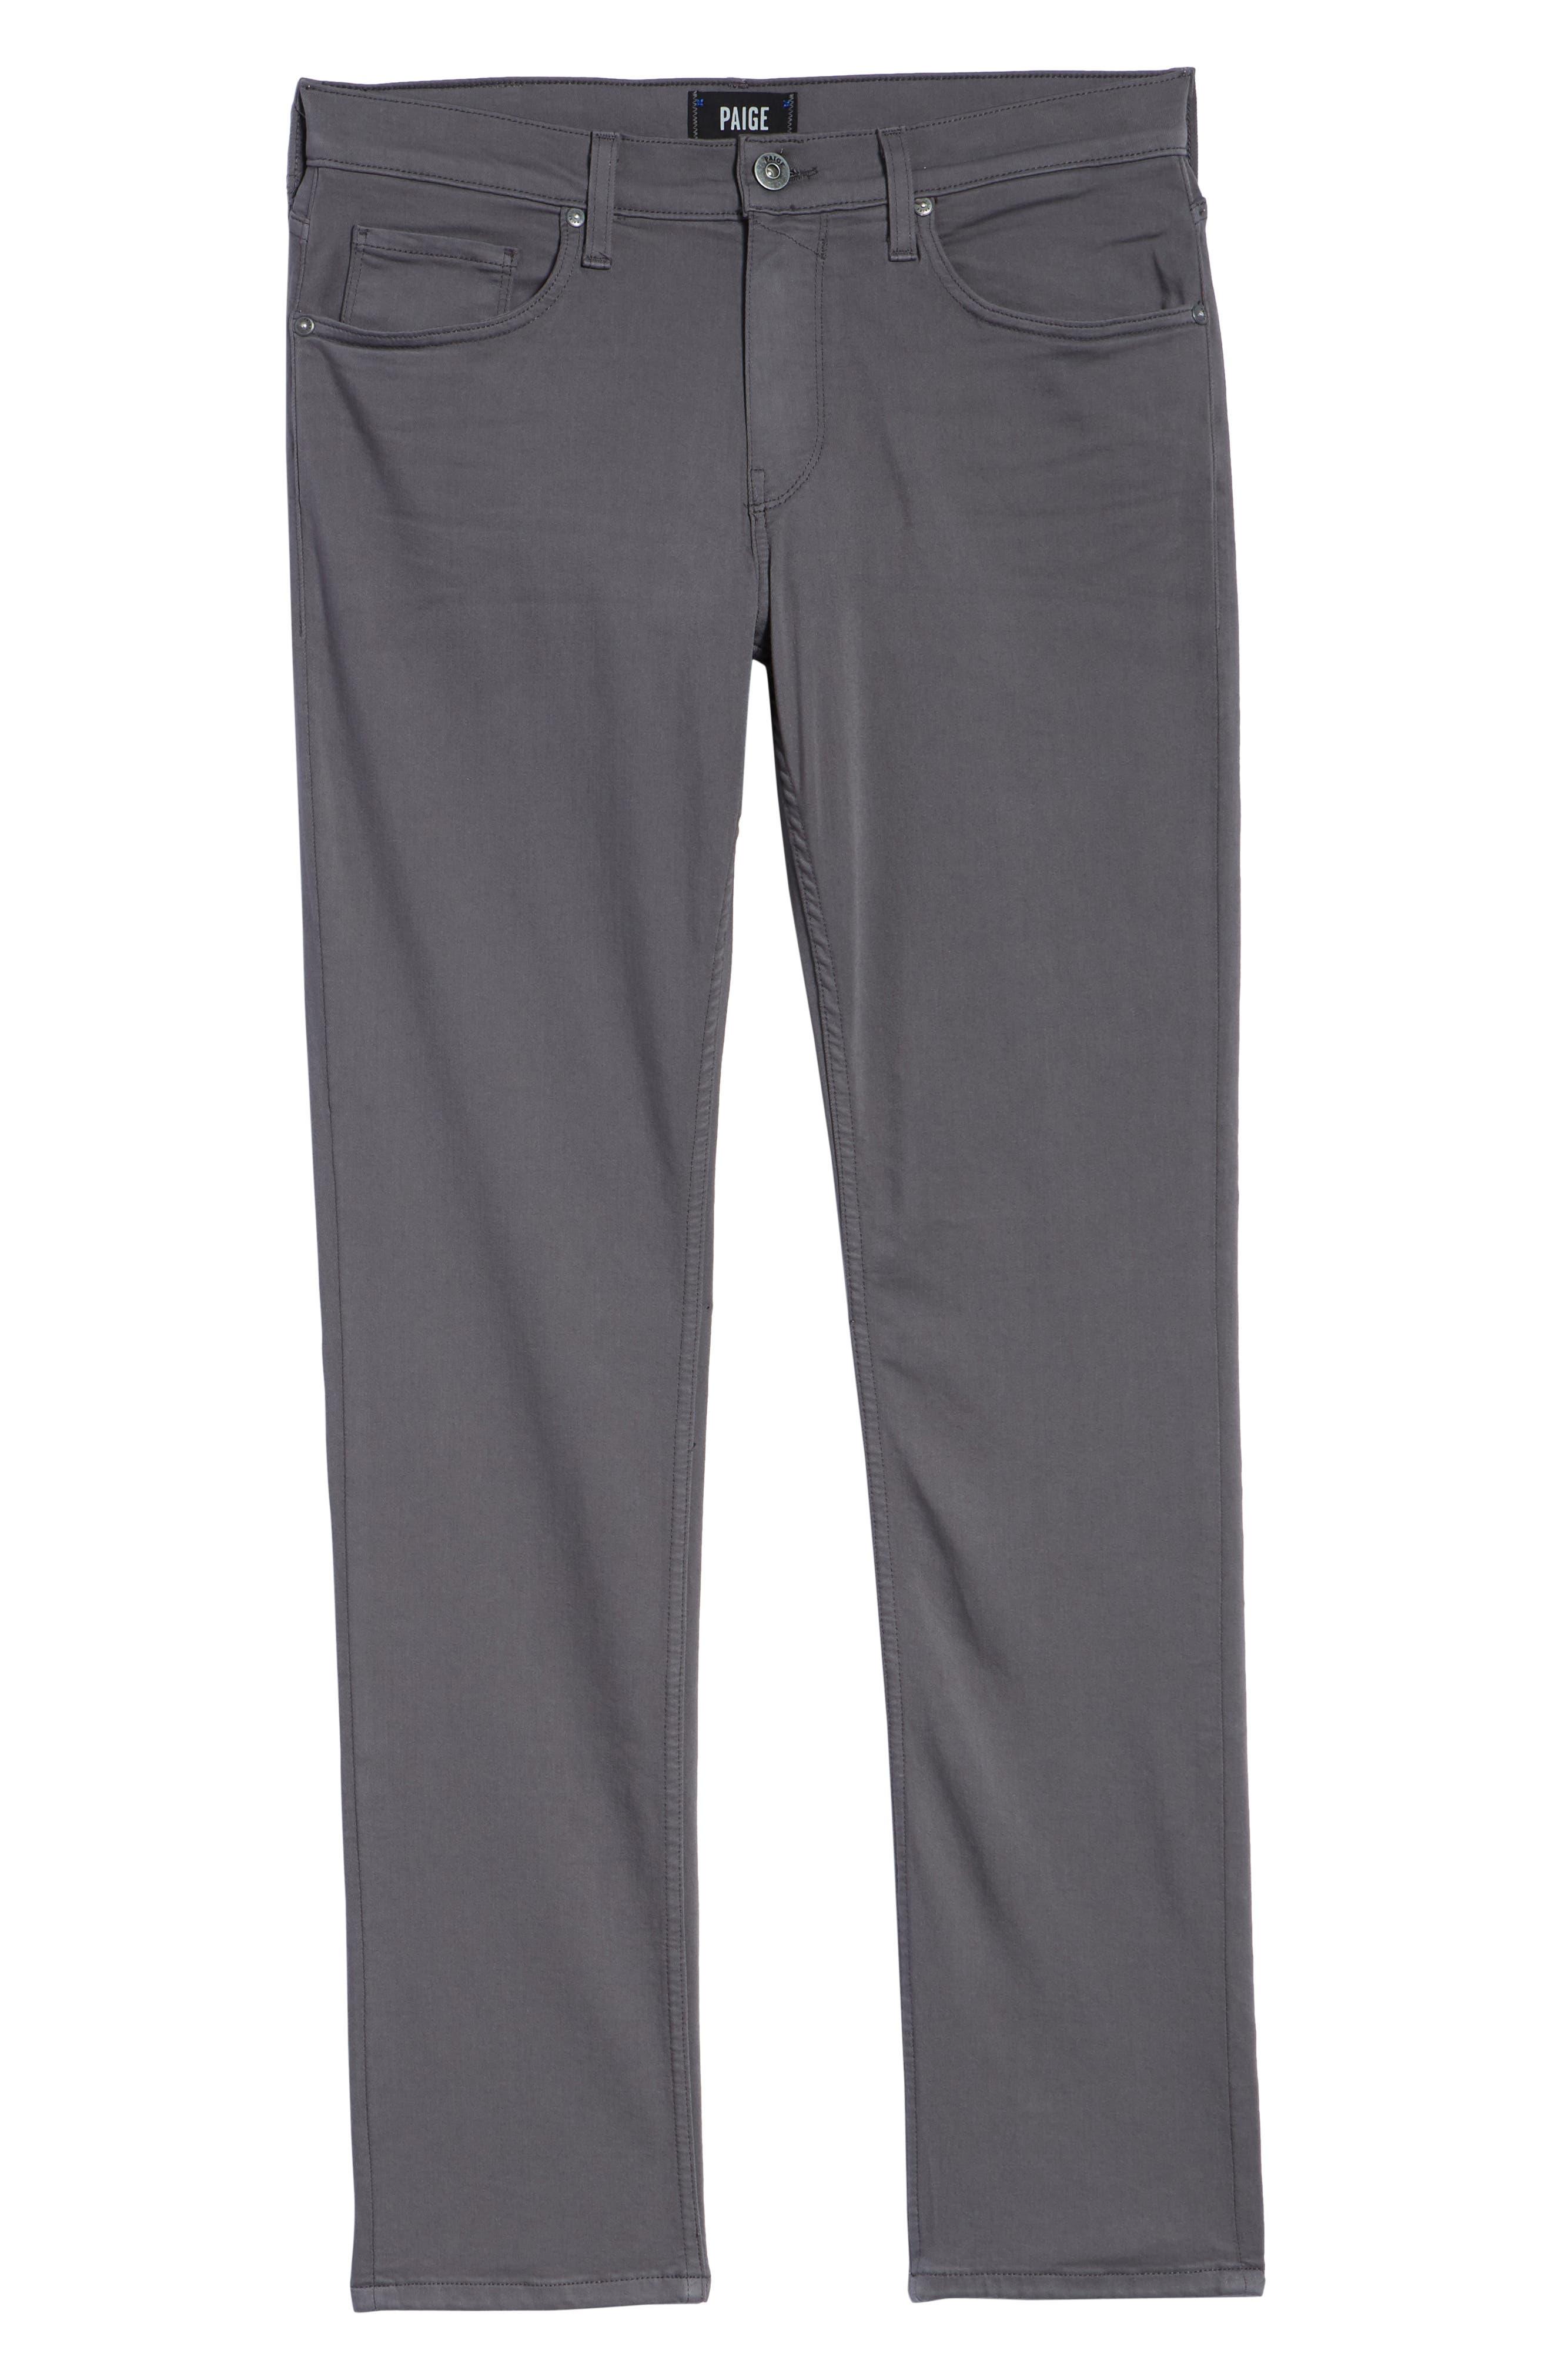 Transcend - Federal Slim Straight Leg Jeans,                             Alternate thumbnail 6, color,                             030